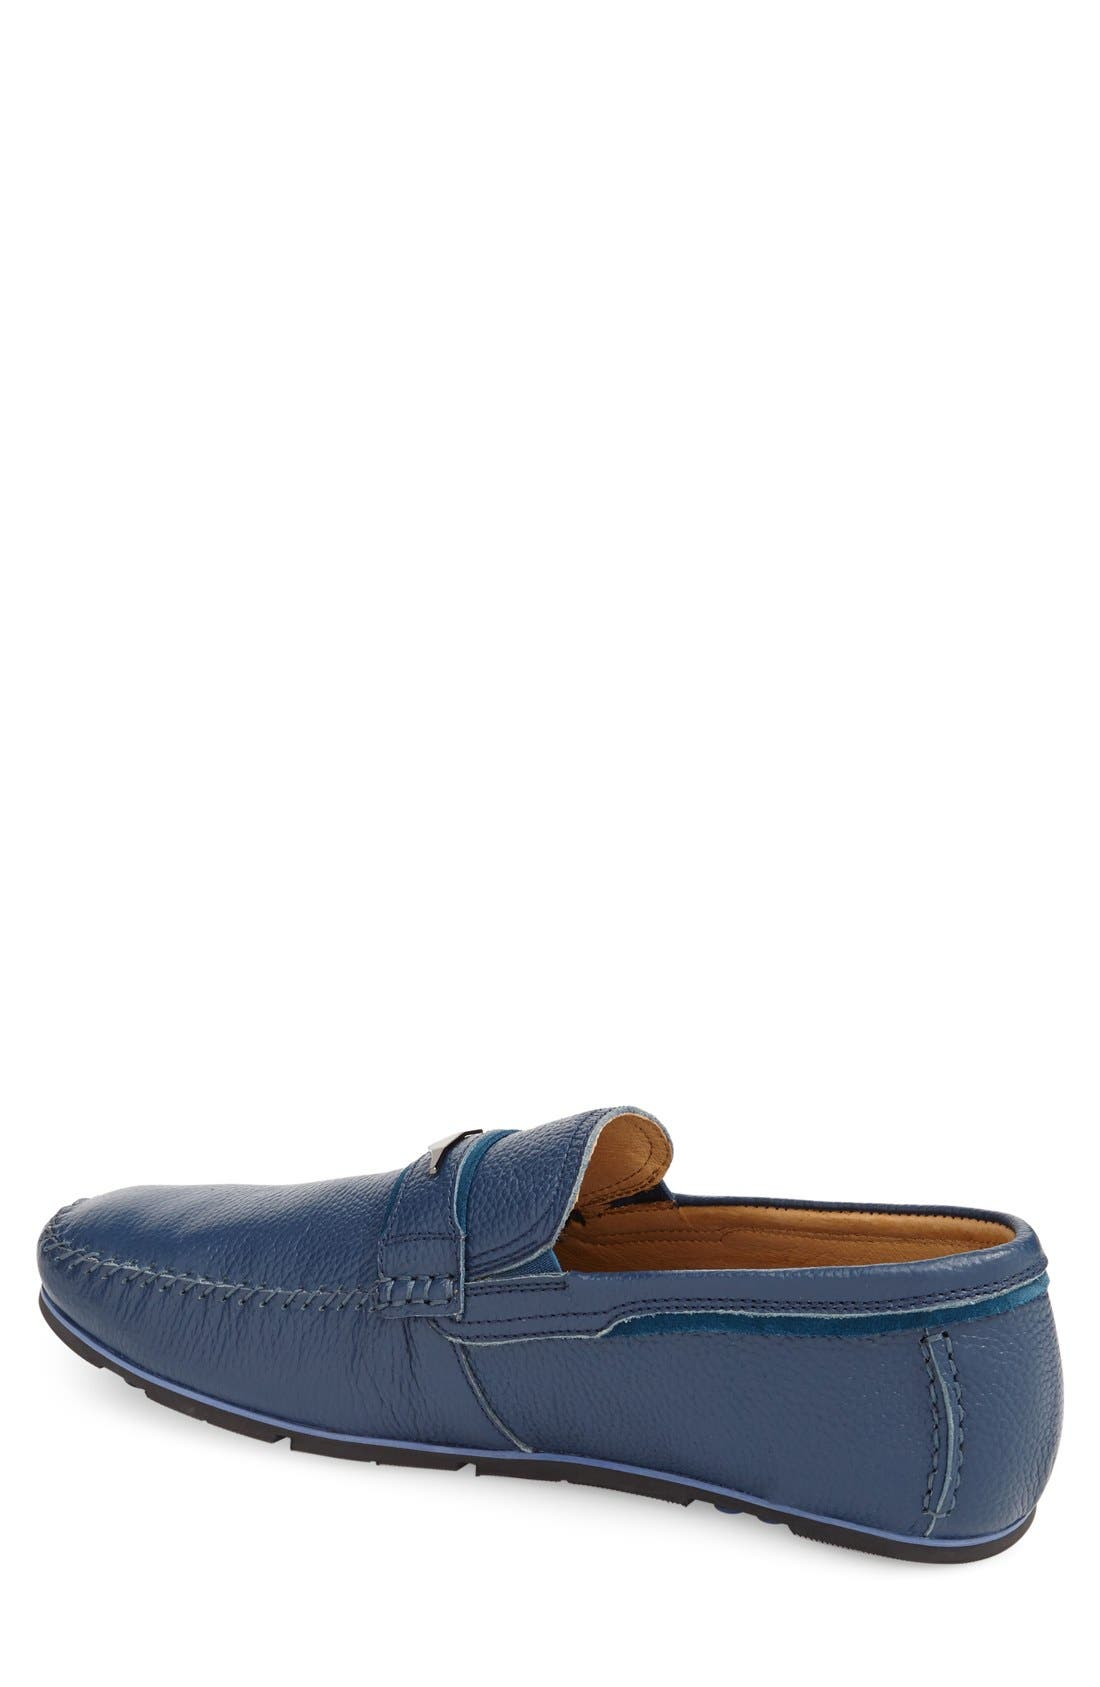 Alternate Image 3  - Zanzara Leather Loafer (Men)